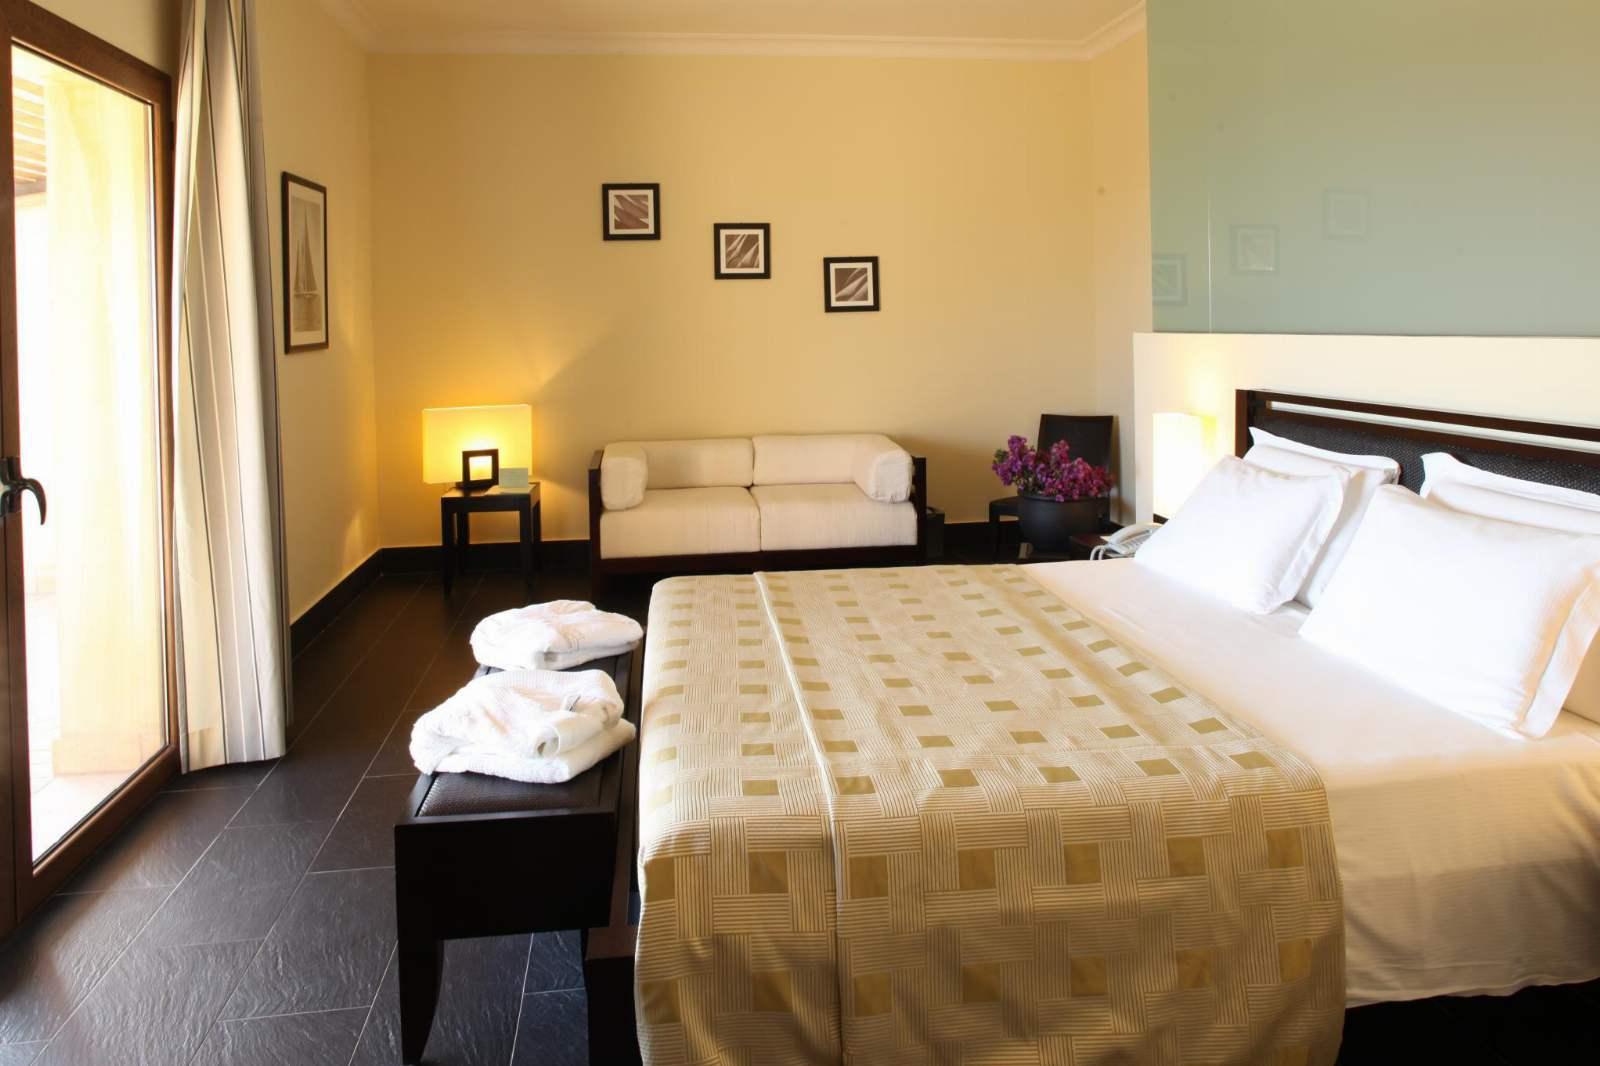 Falconara Resort & Spa: room / property / locale photo. Image 2